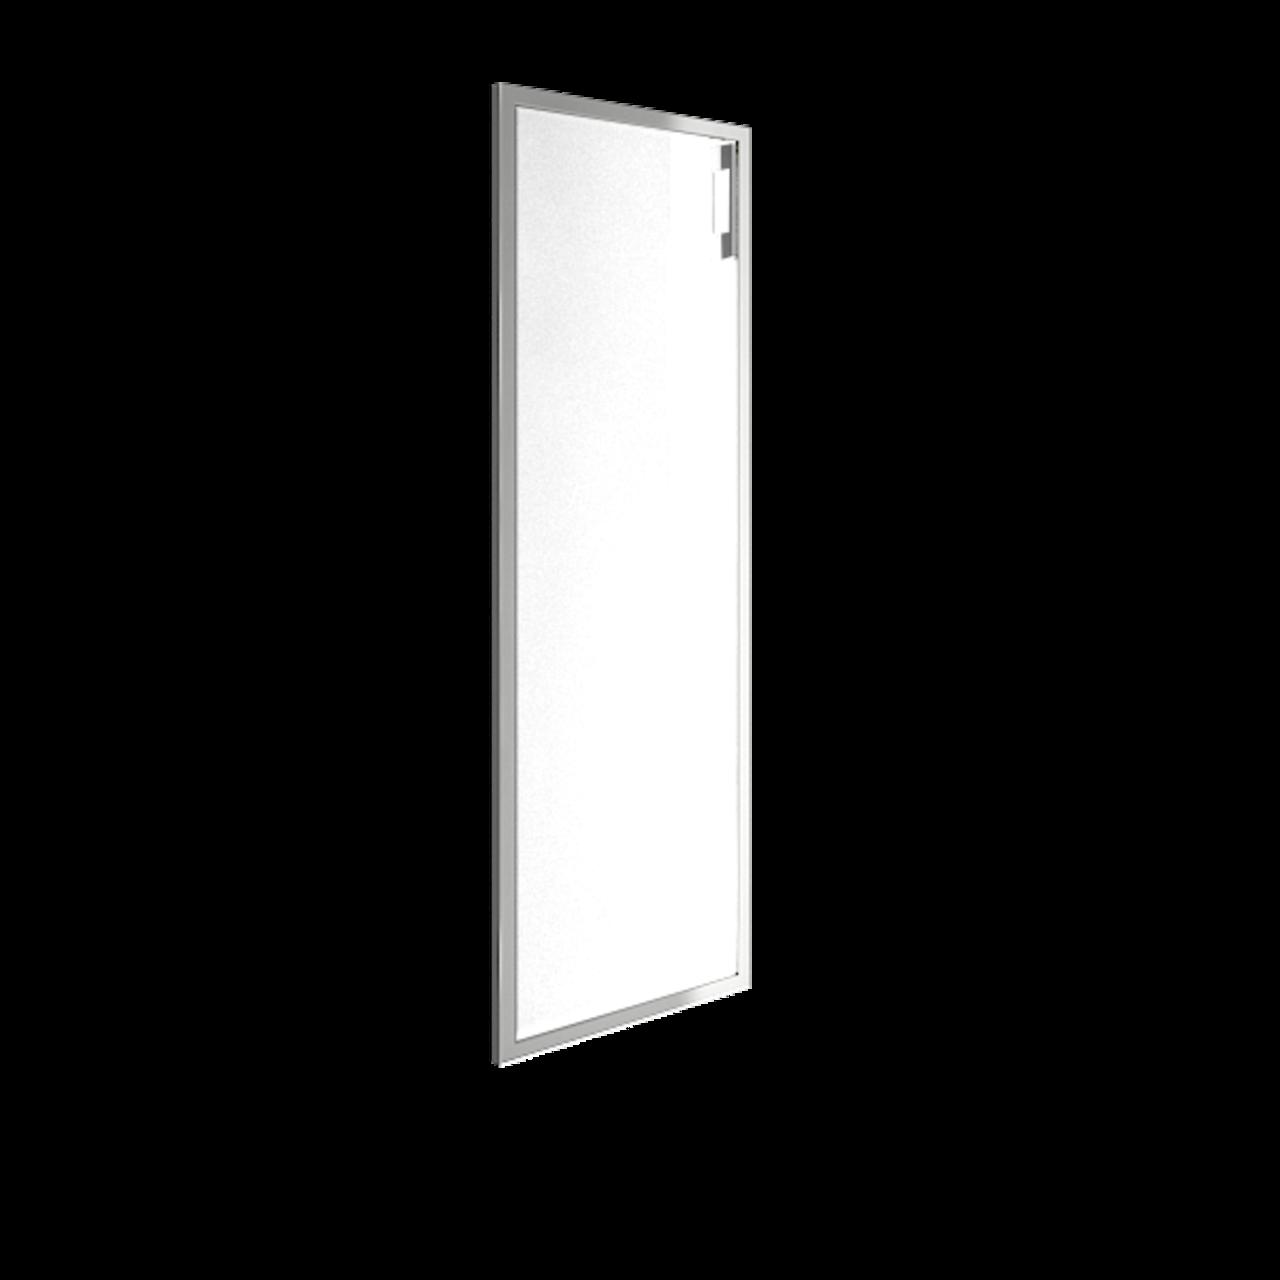 Дверь стекло в раме среднее Lacobel white левая - фото 1